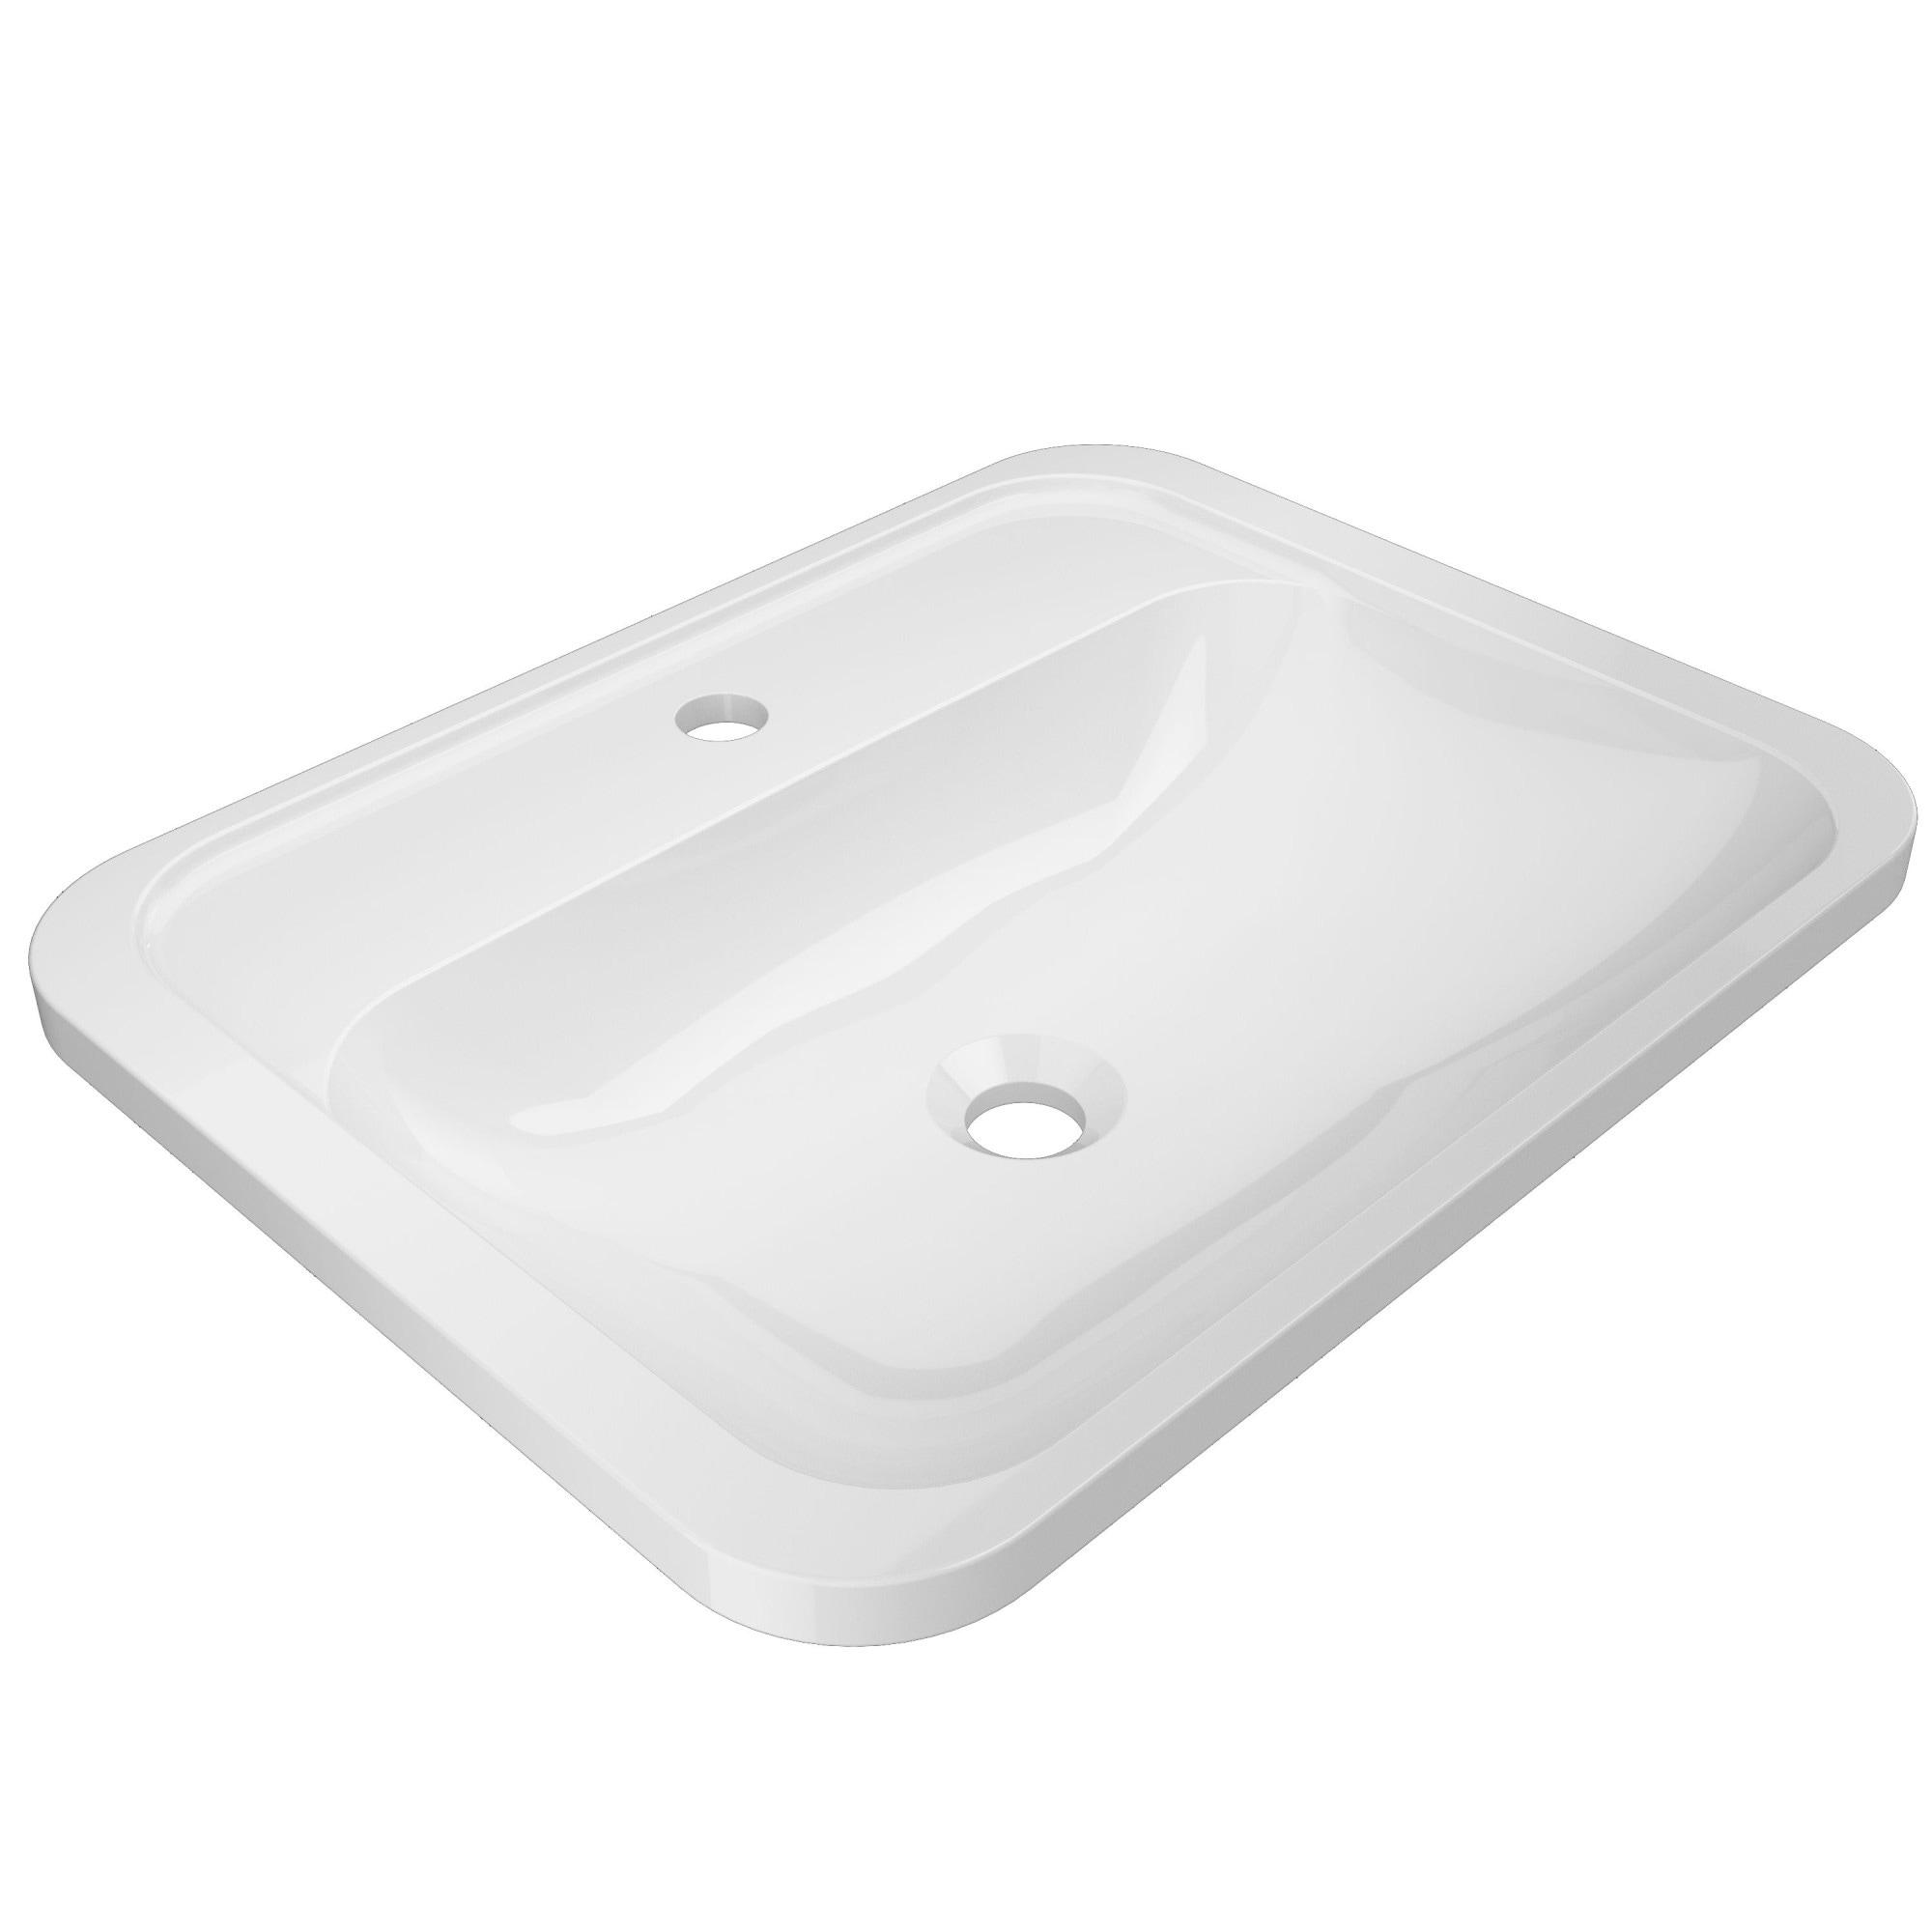 shop jacuzzi avu2217 avila 21 5 8in solid surface undermount rh overstock com  jacuzzi astracast kitchen sinks